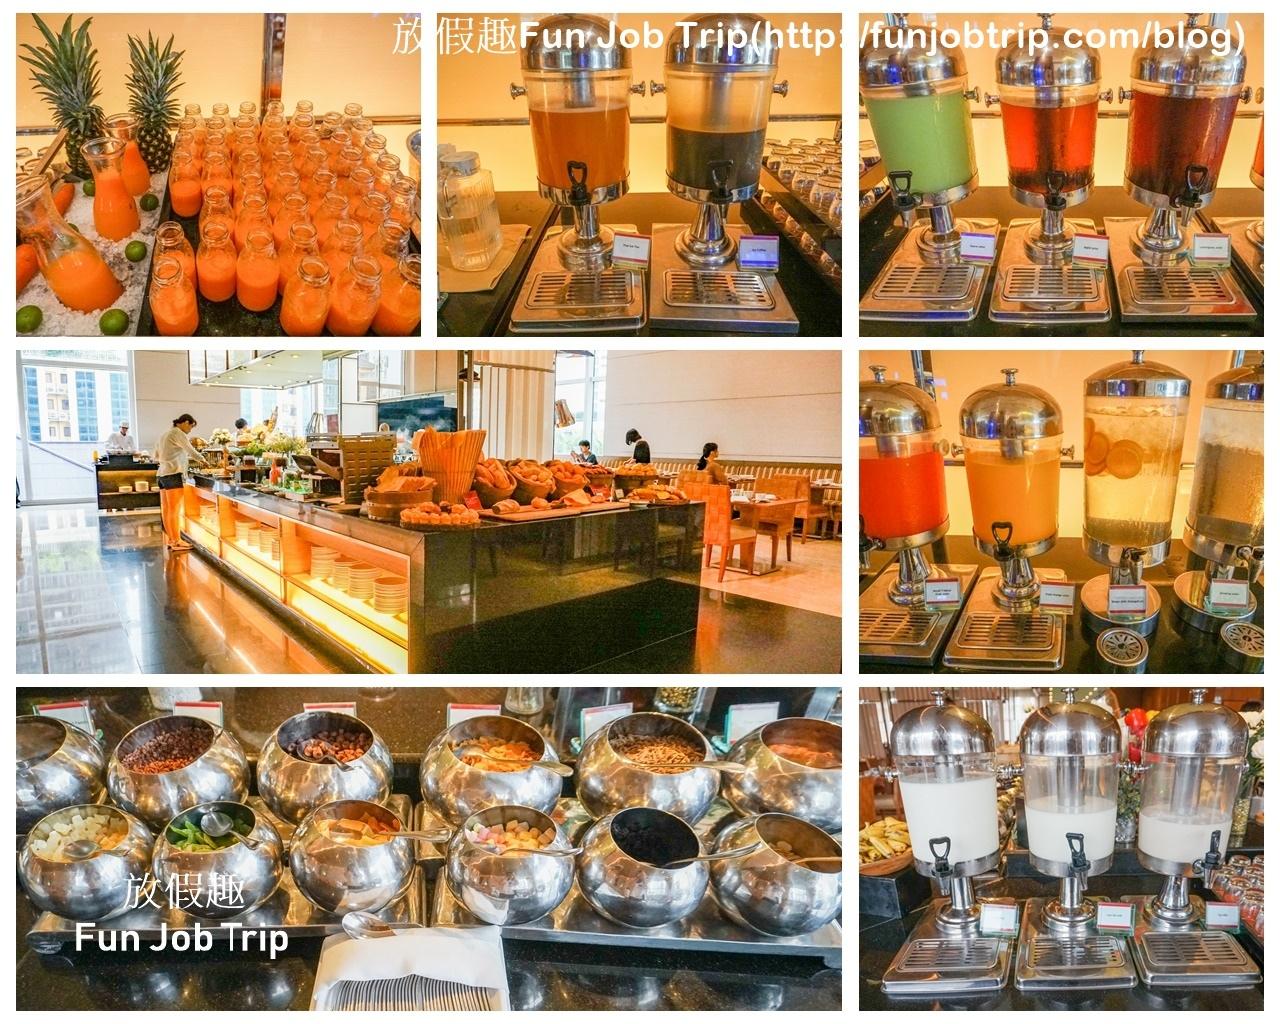 056_Eastin Grand Hotel Sathorn Bangkok.jpg